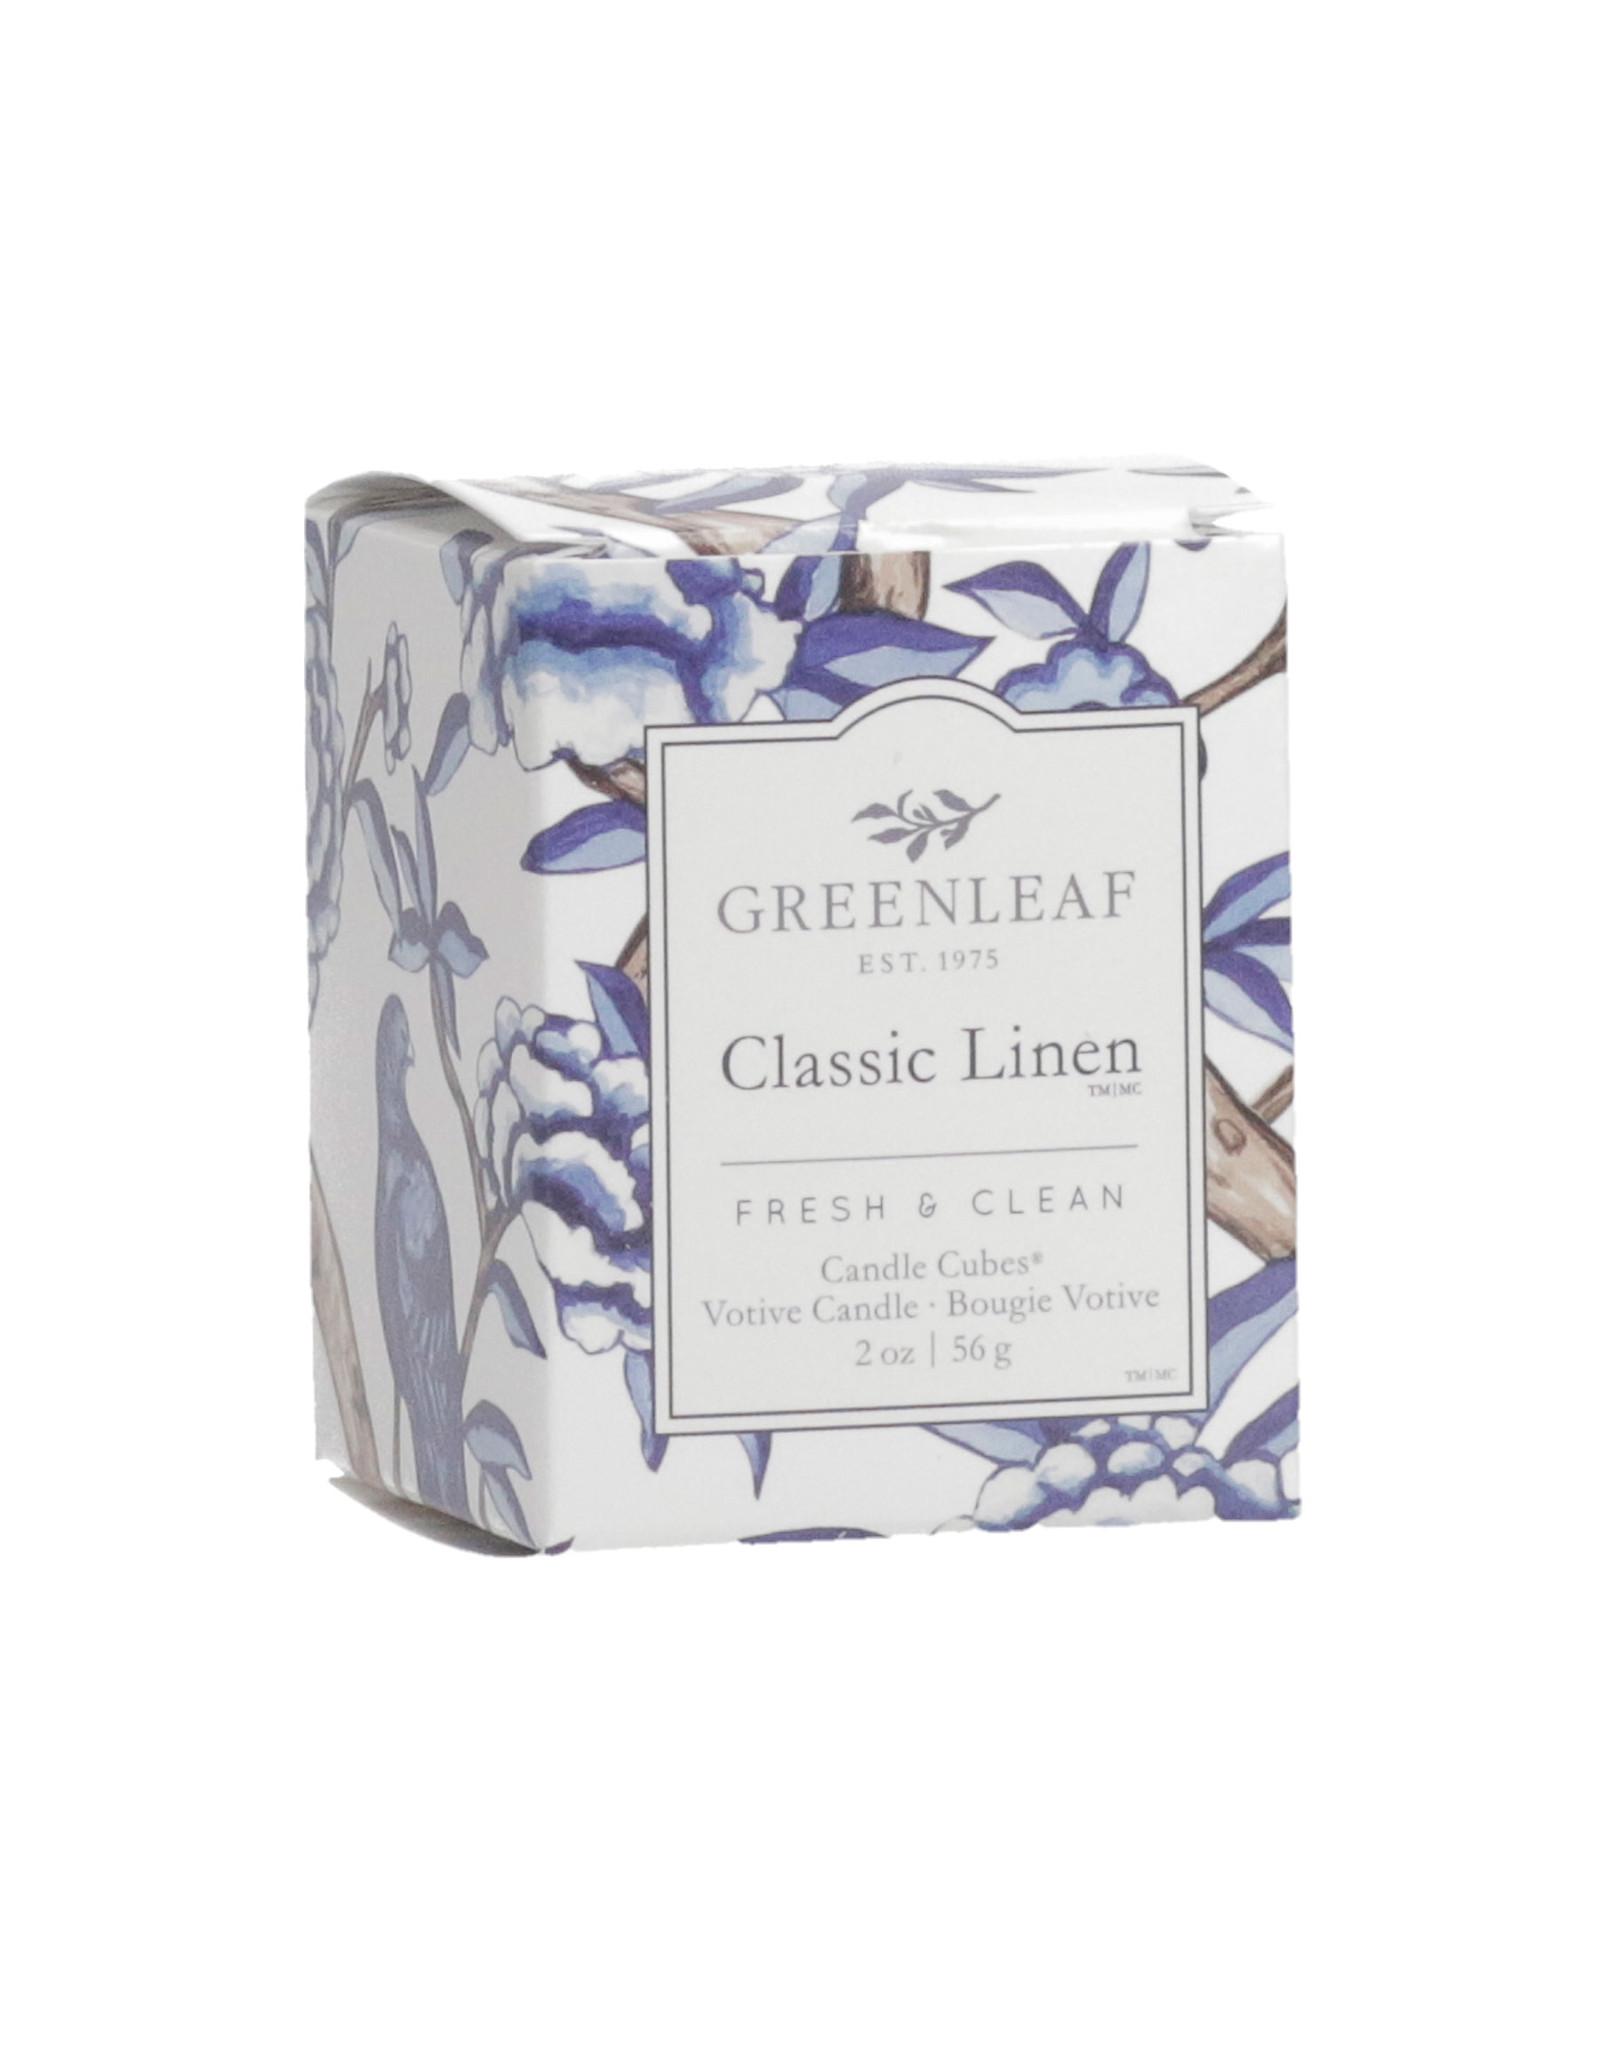 Greenleaf Classic Linen Candle Votive